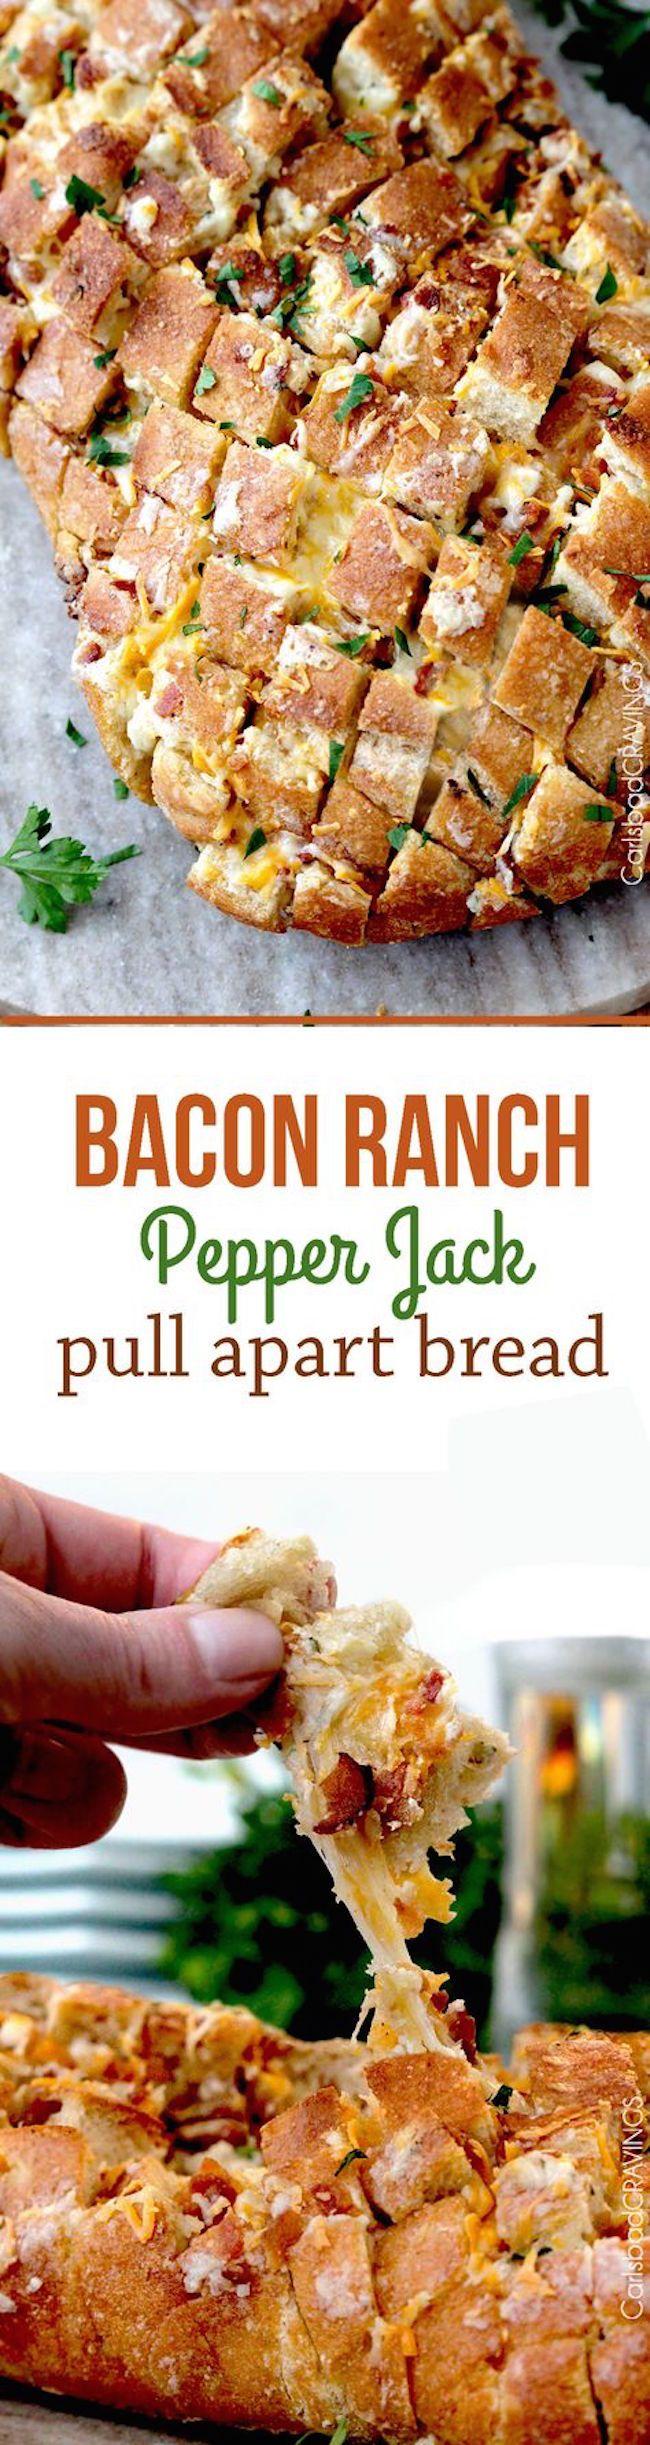 Bacon Ranch Pepper Jack Pull Apart Bread